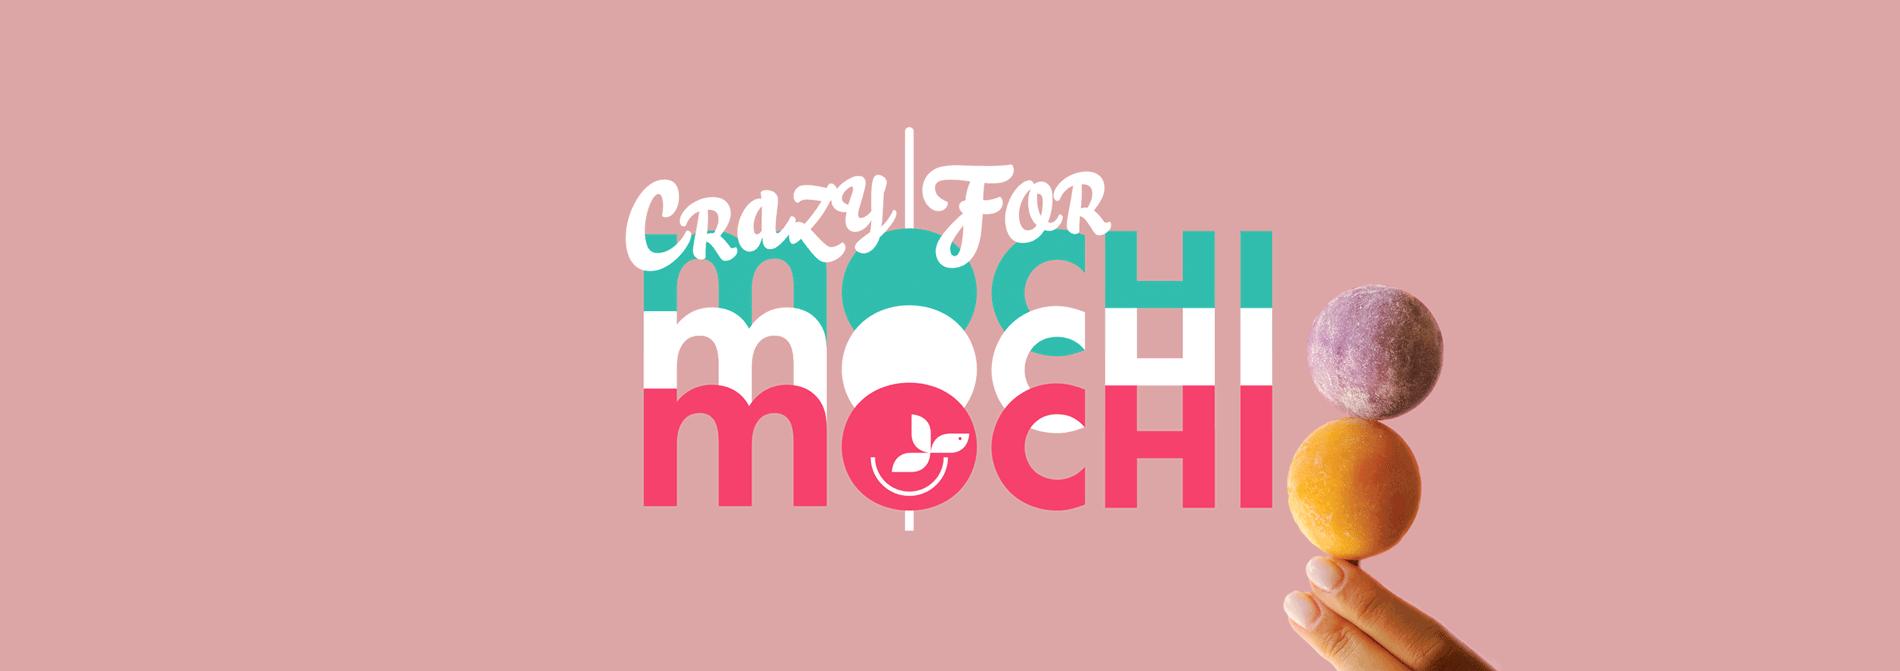 A stick of mochi ice cream balls